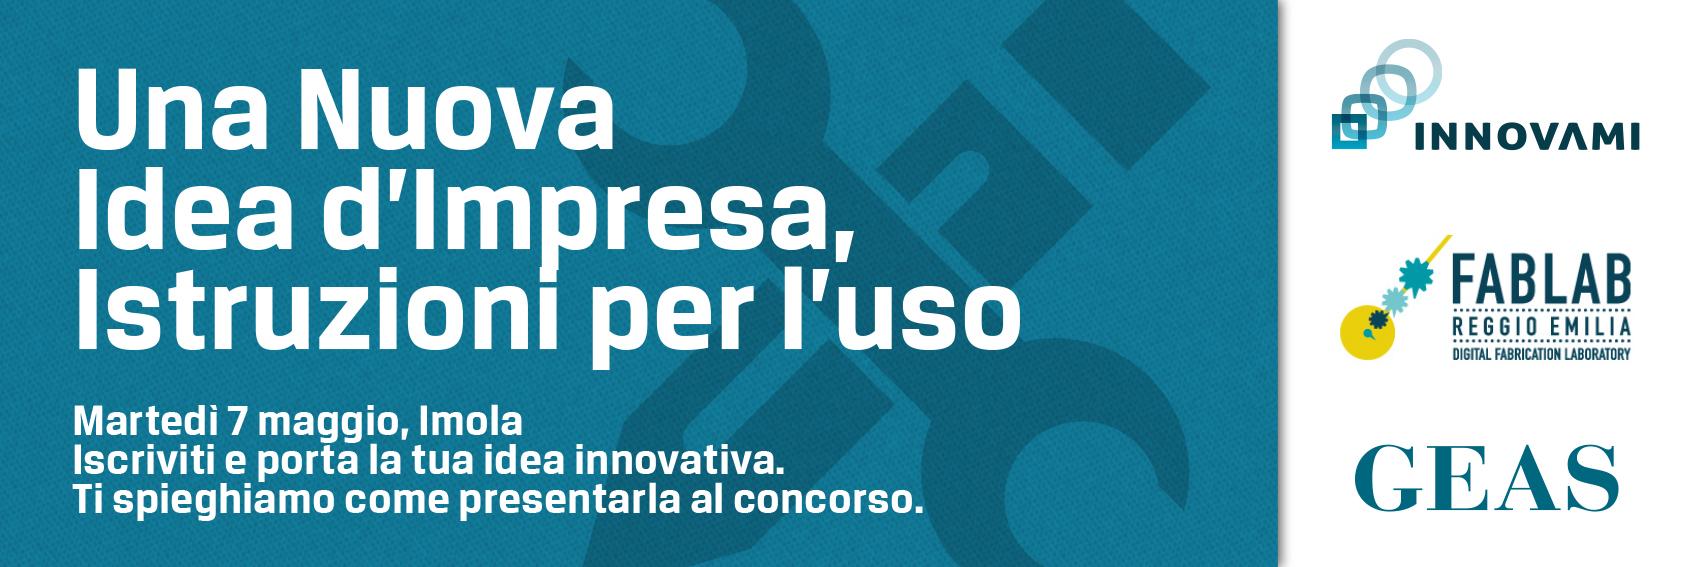 Una Nuova idea d'Impresa - Innovami Imola